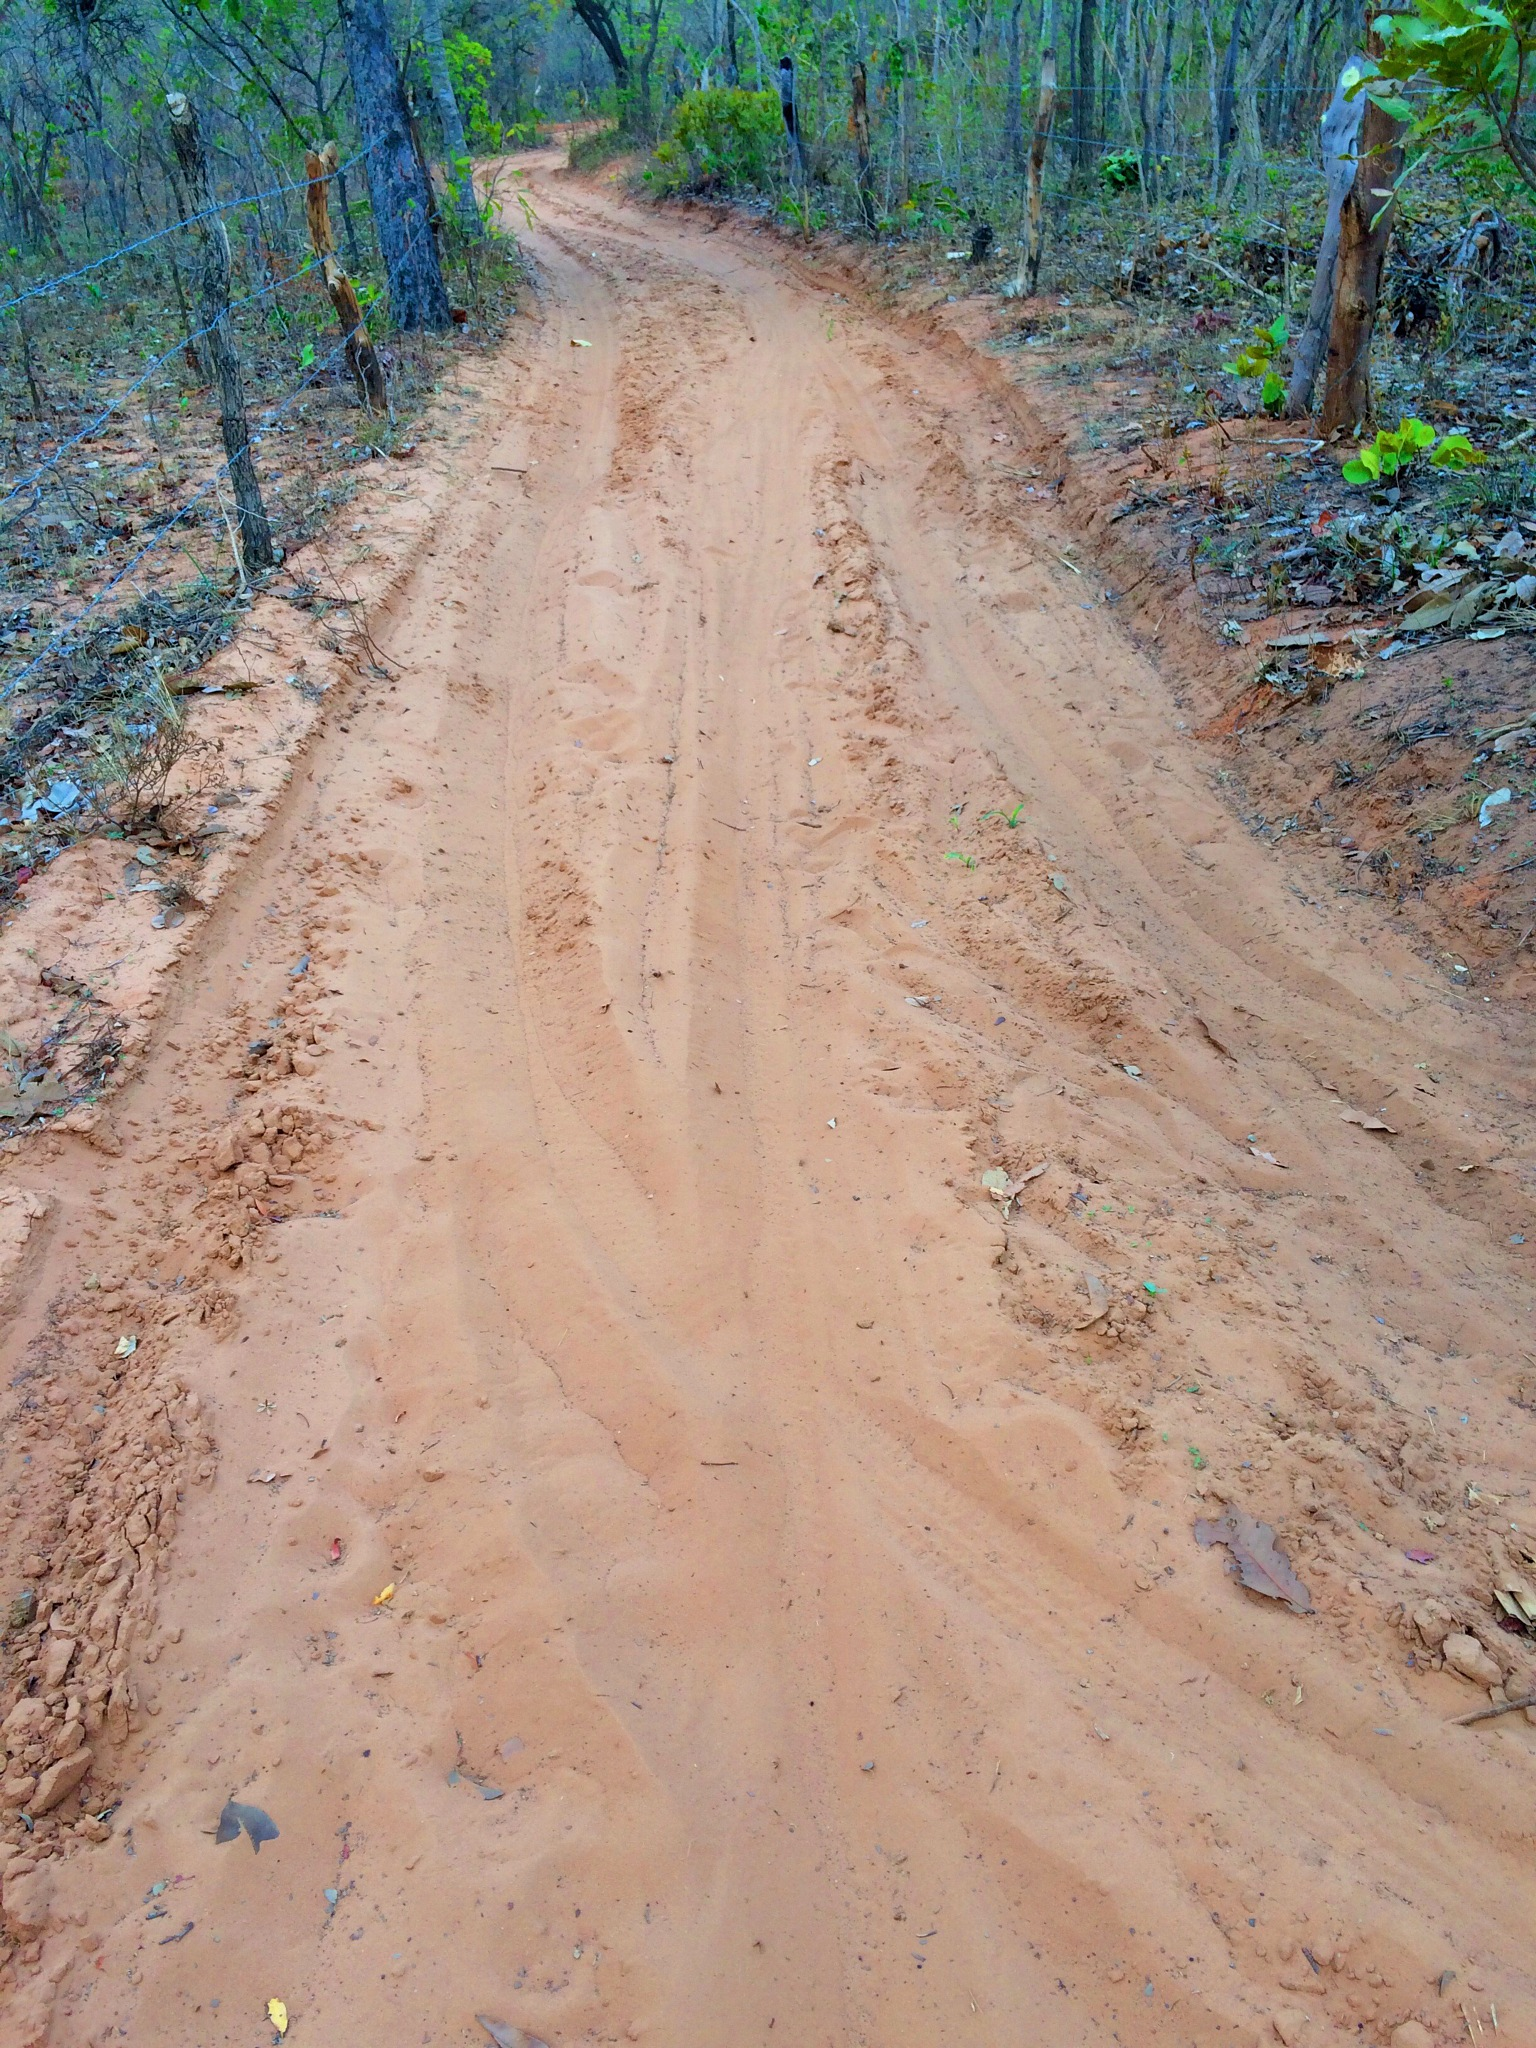 Sand road  by vitorlpb